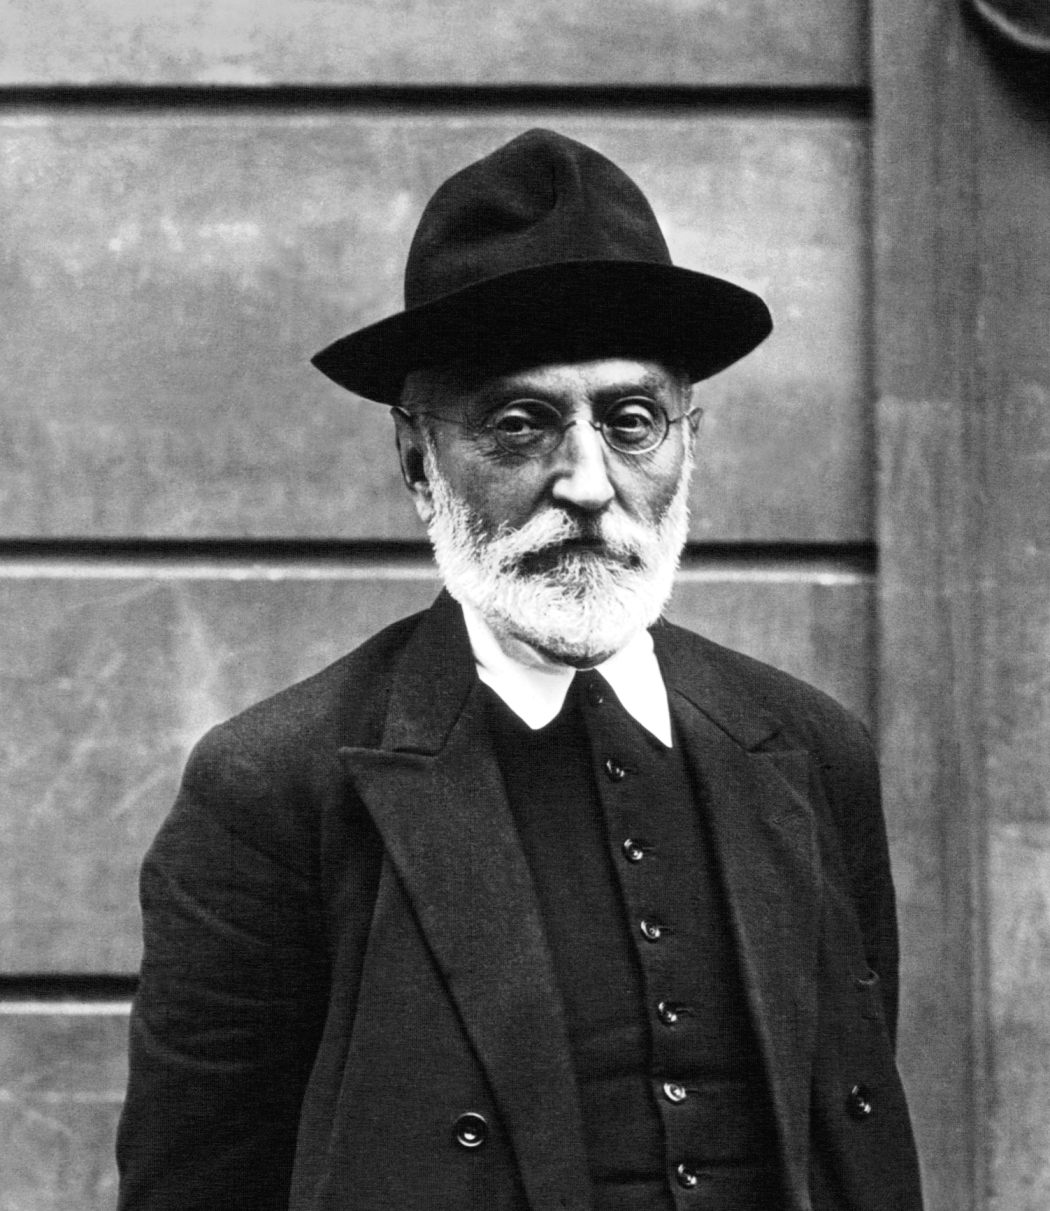 Miguel_de_Unamuno_Meurisse_1925